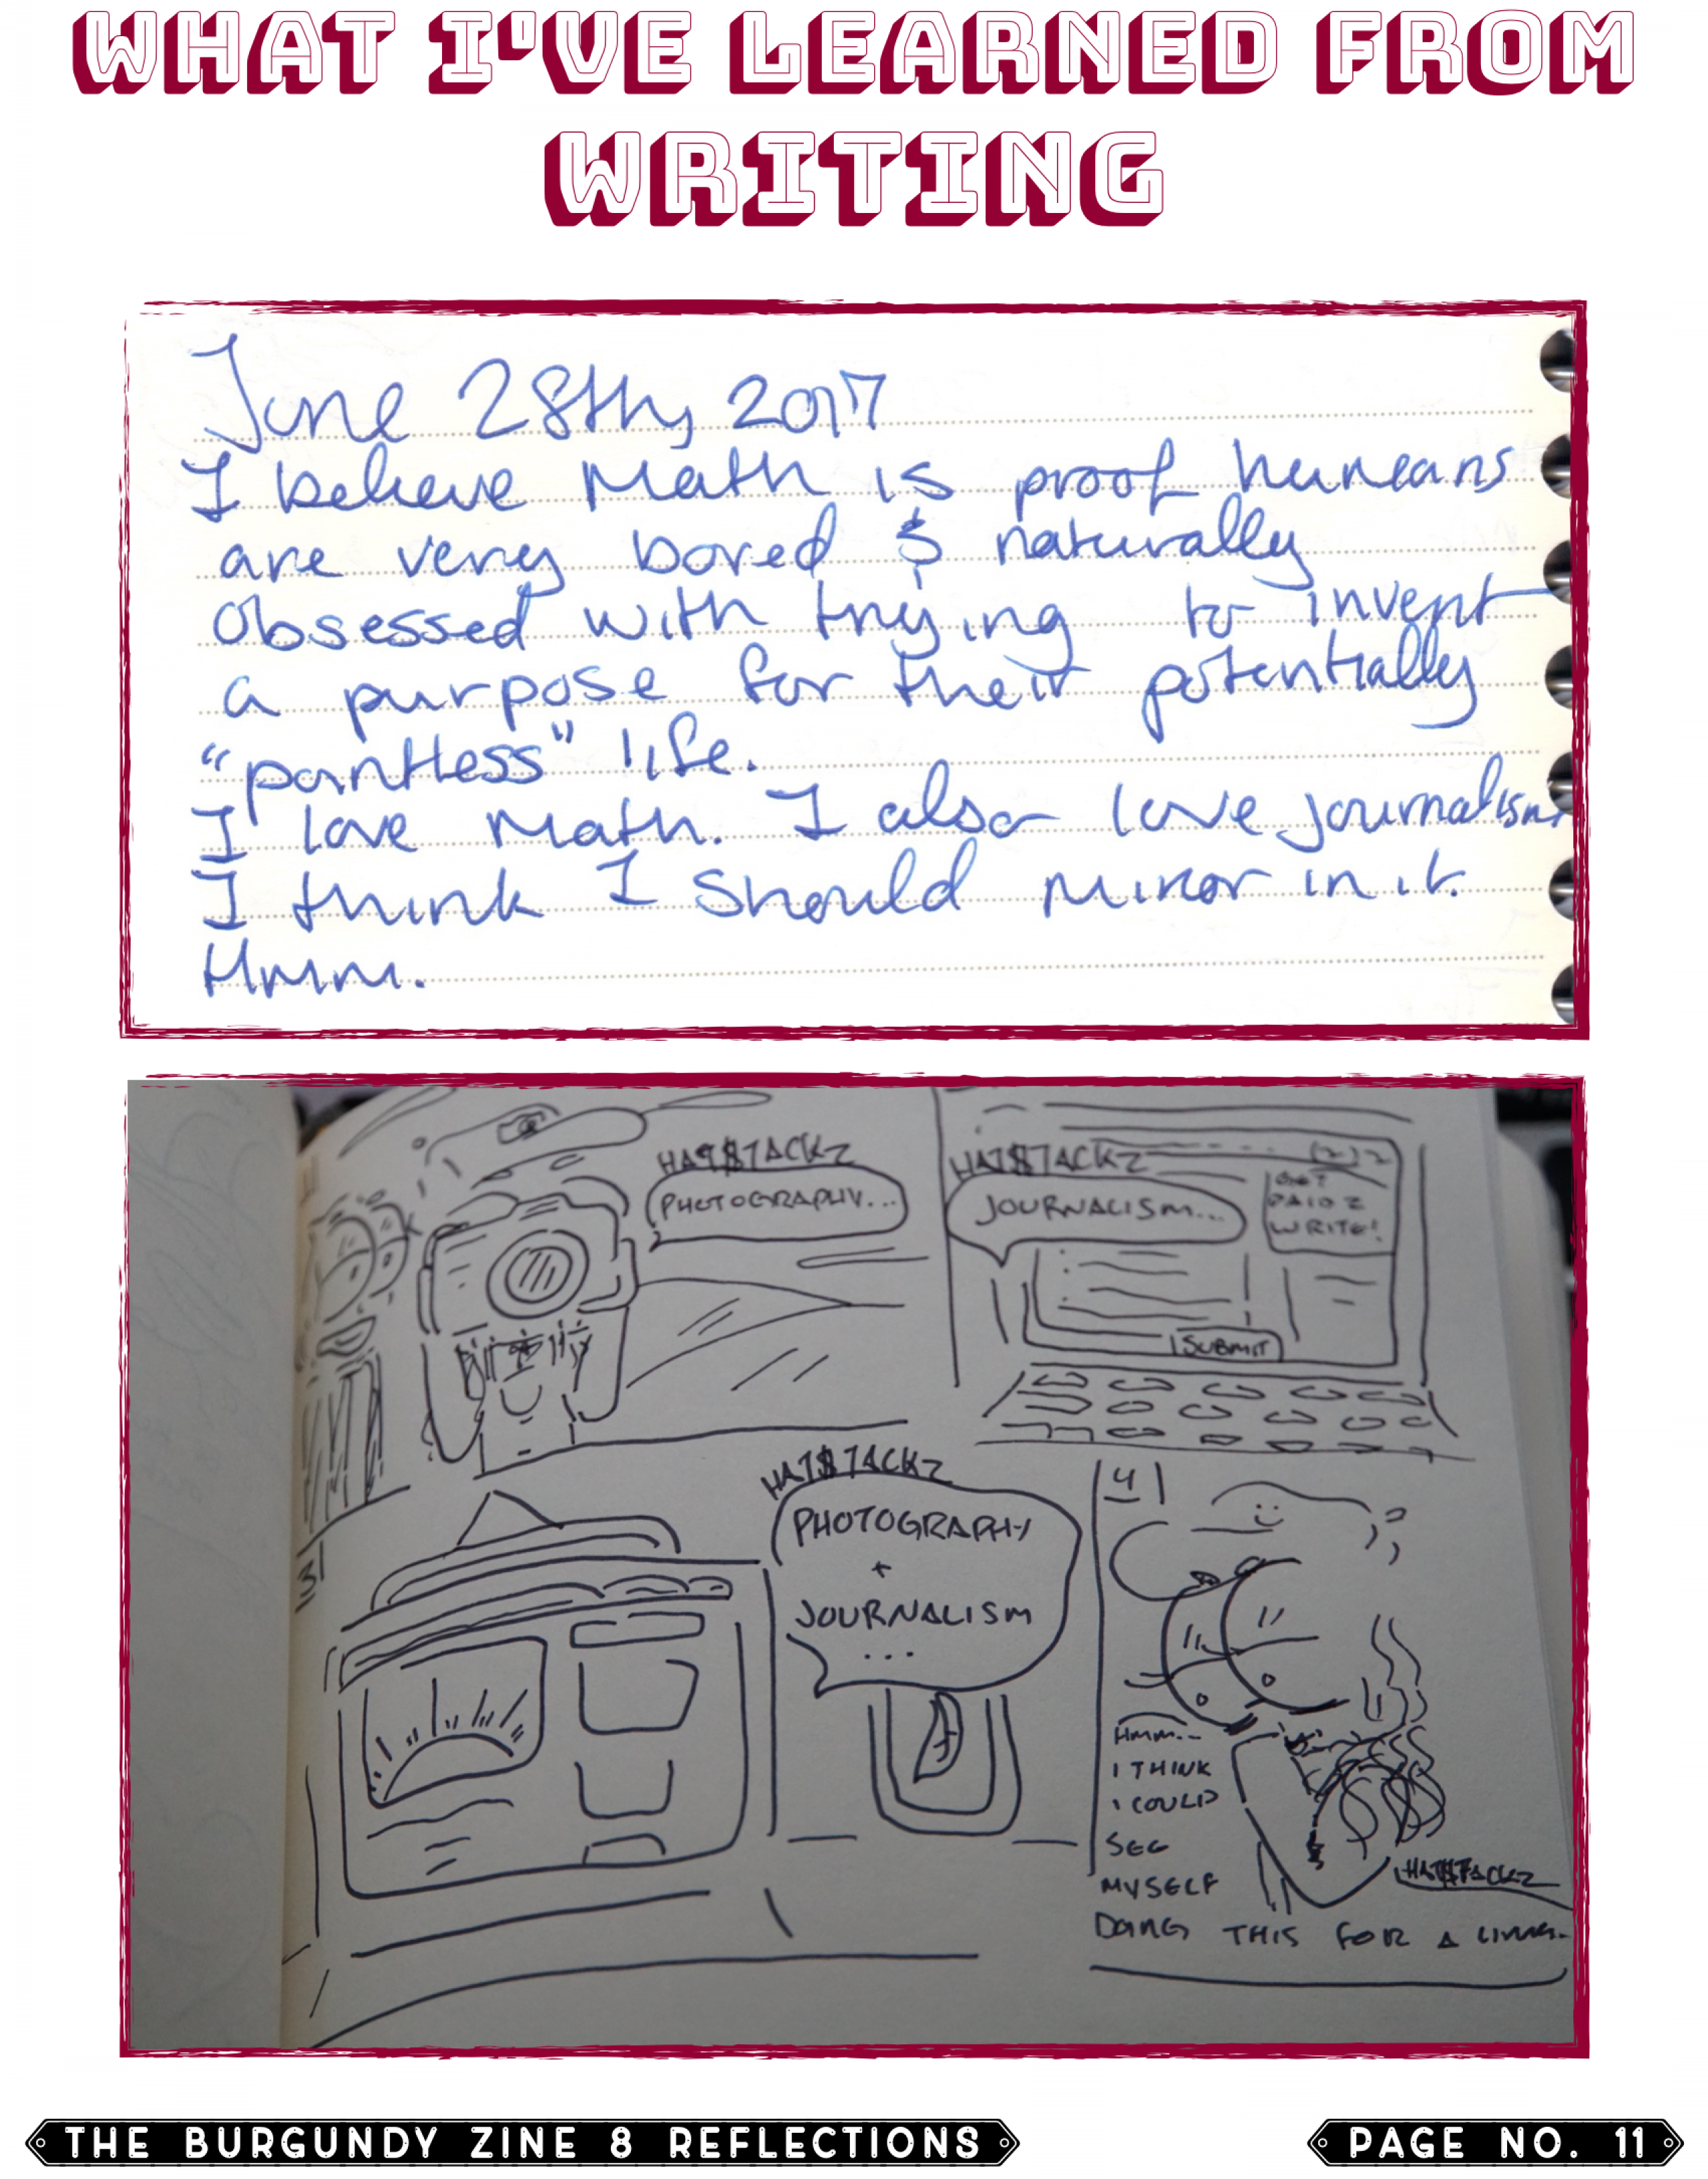 The Burgundy Zine #8 Reflections 011